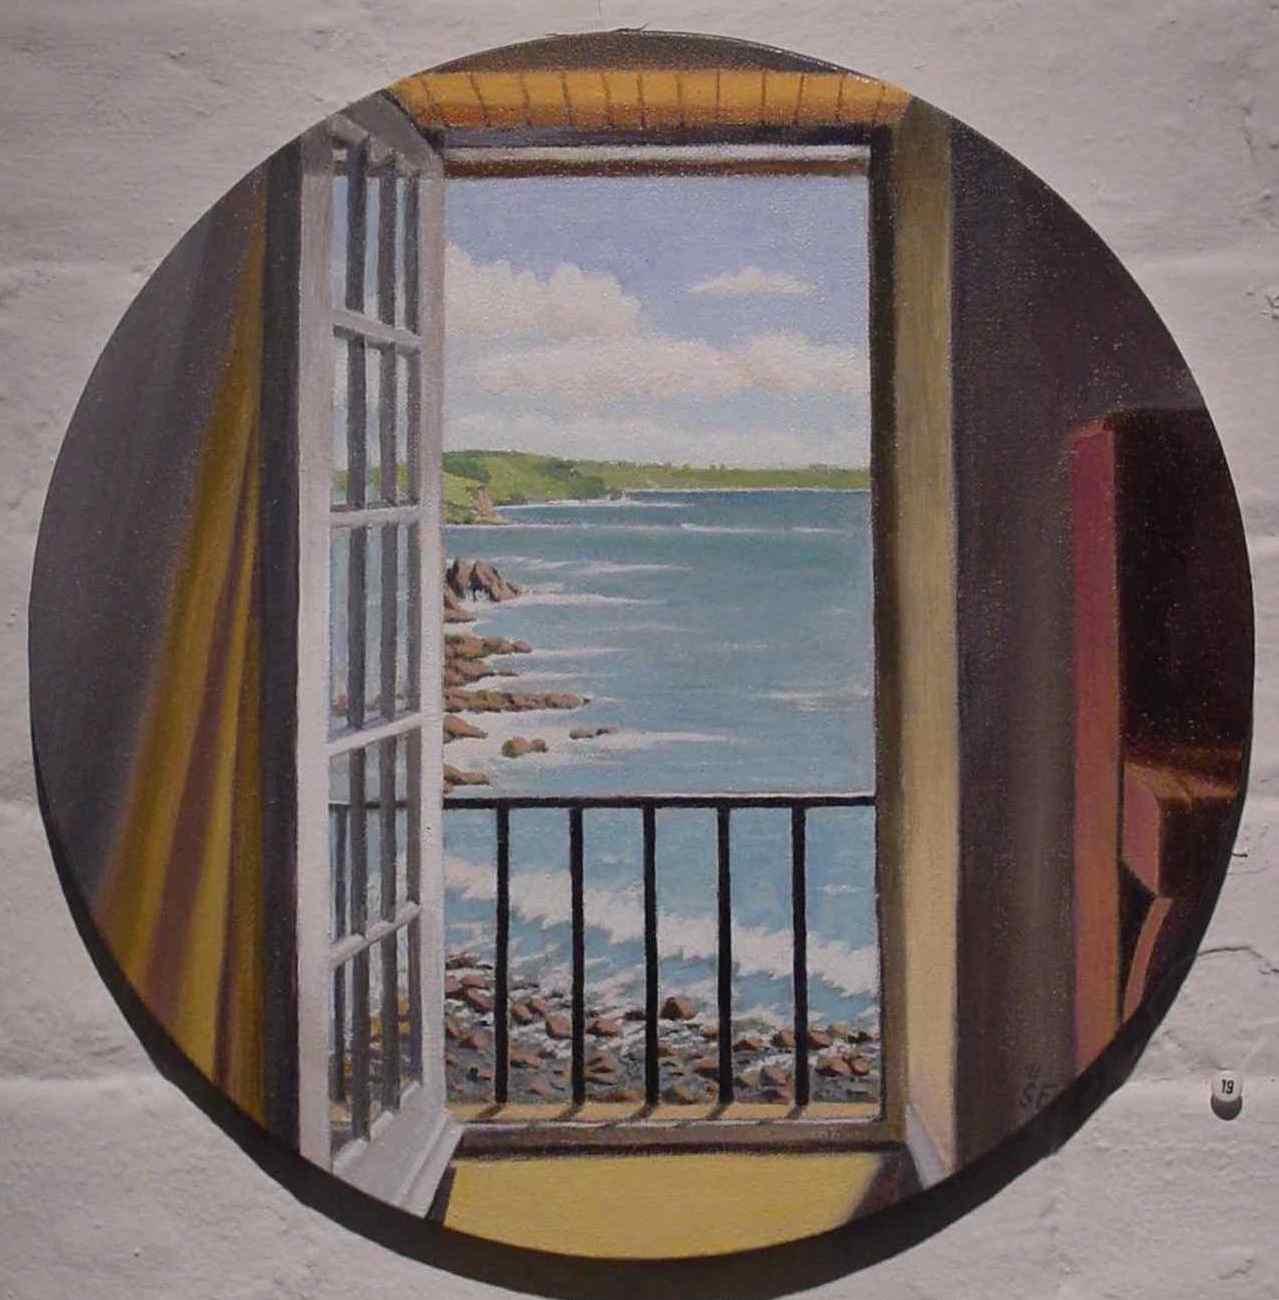 File:Cornwall Door By Sharyn Finnegan 02